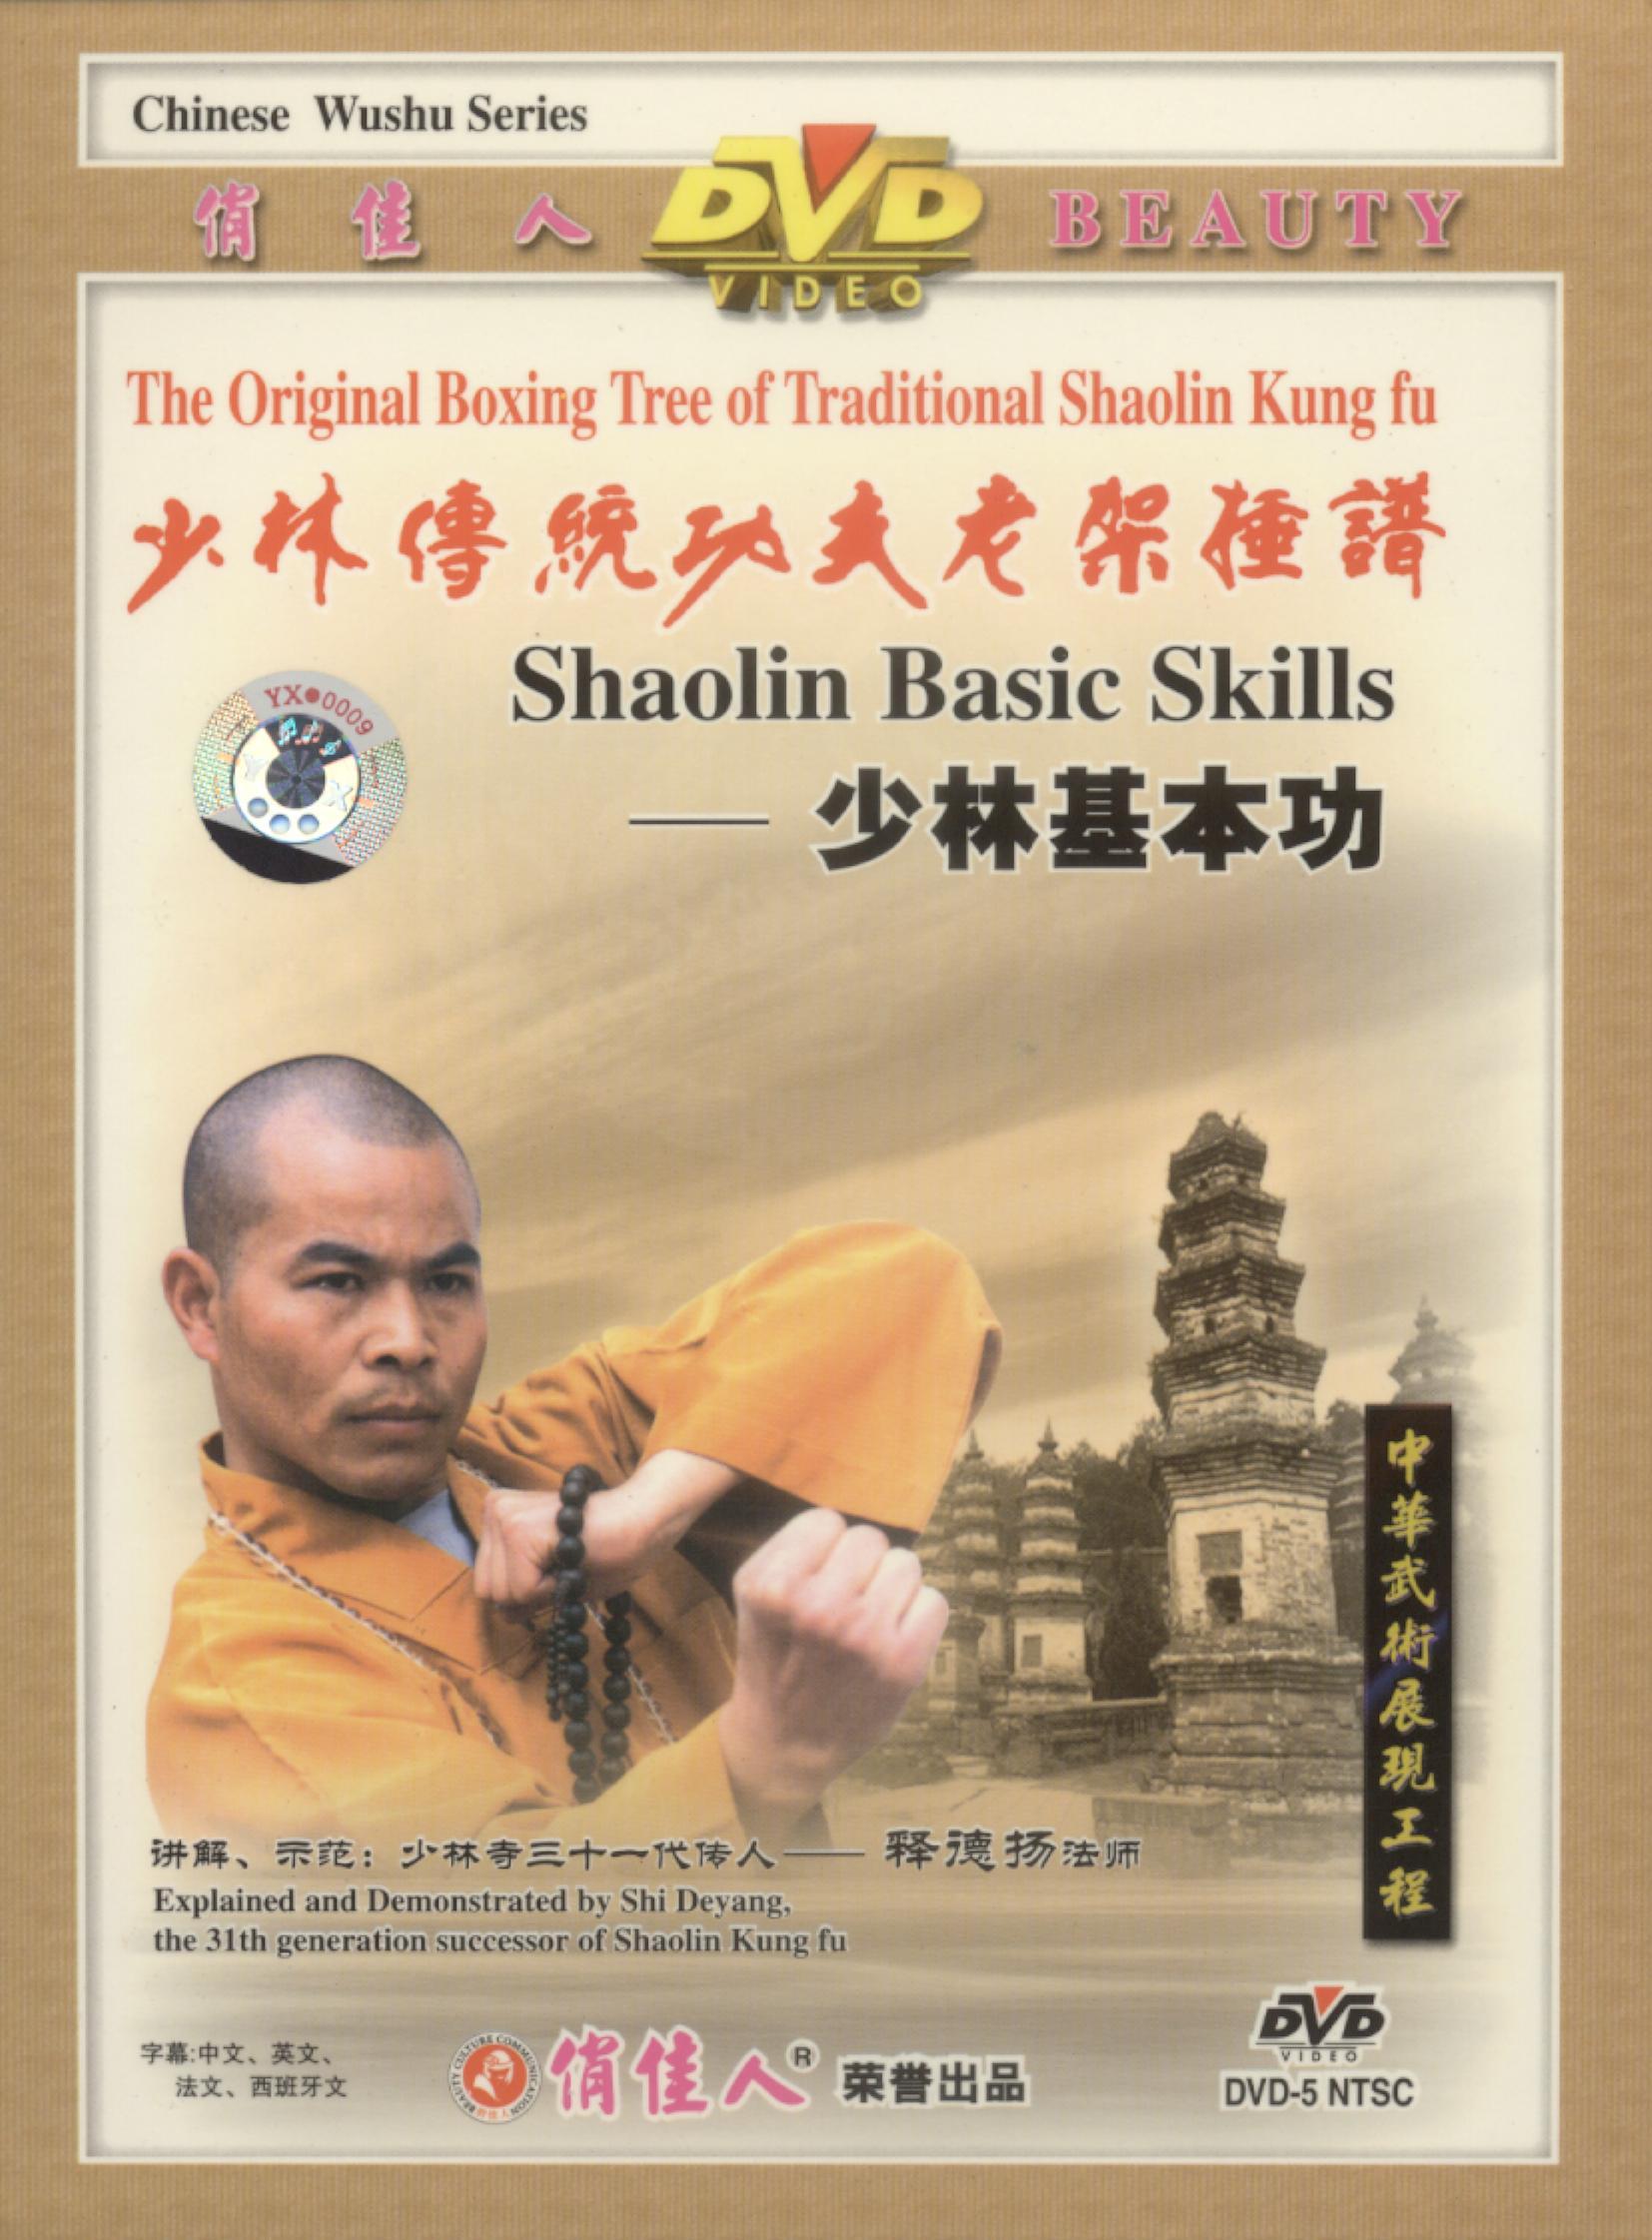 Shaolin Basic Skills, Vol. 1